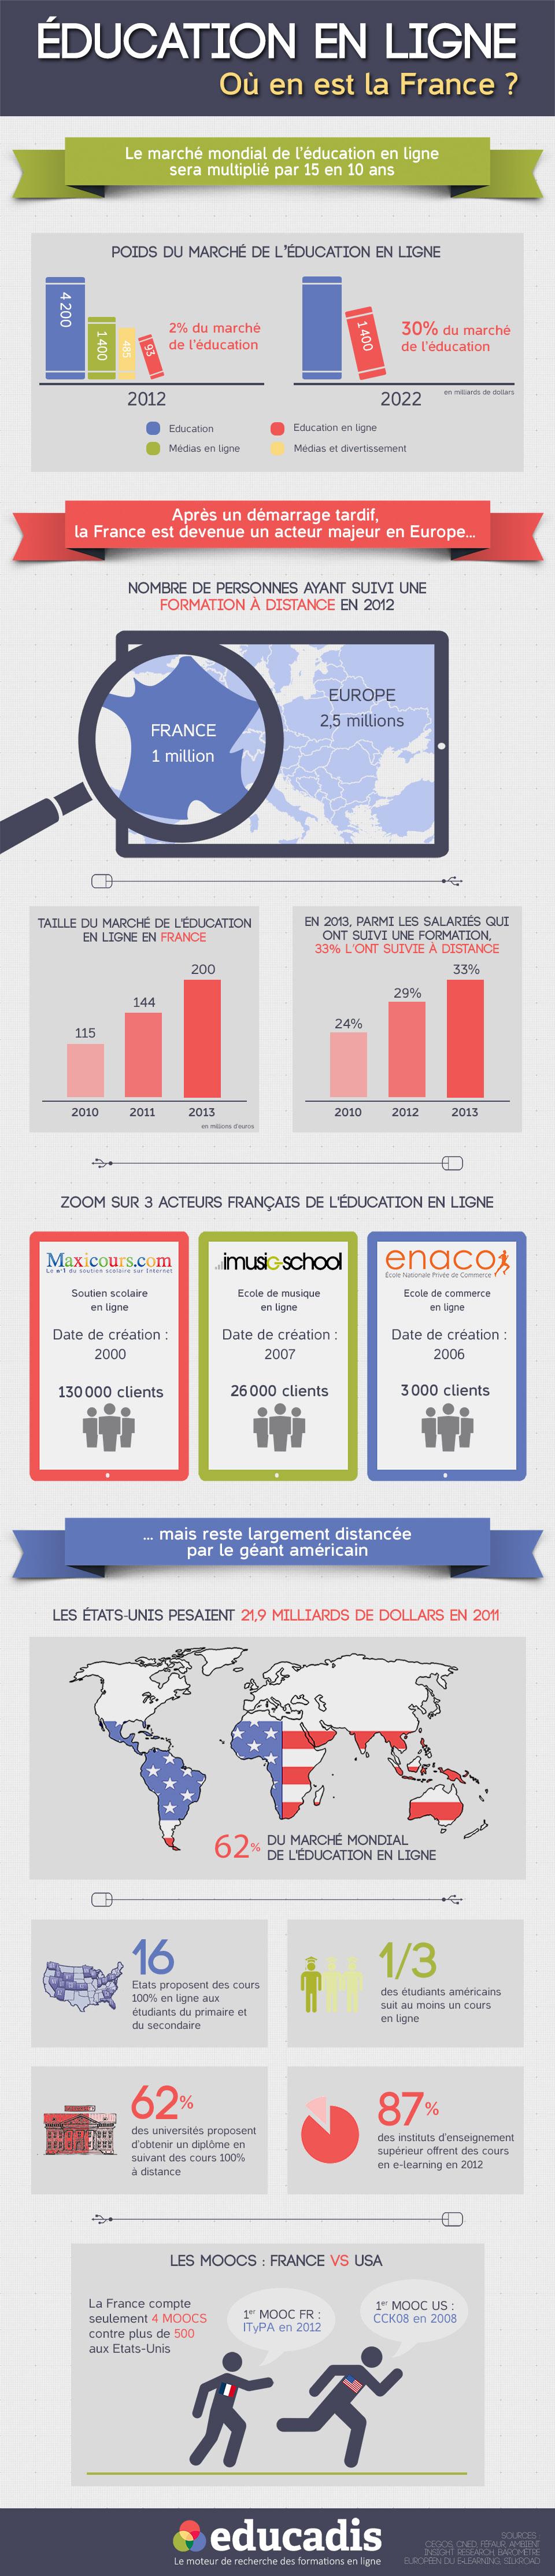 infographie-educadis